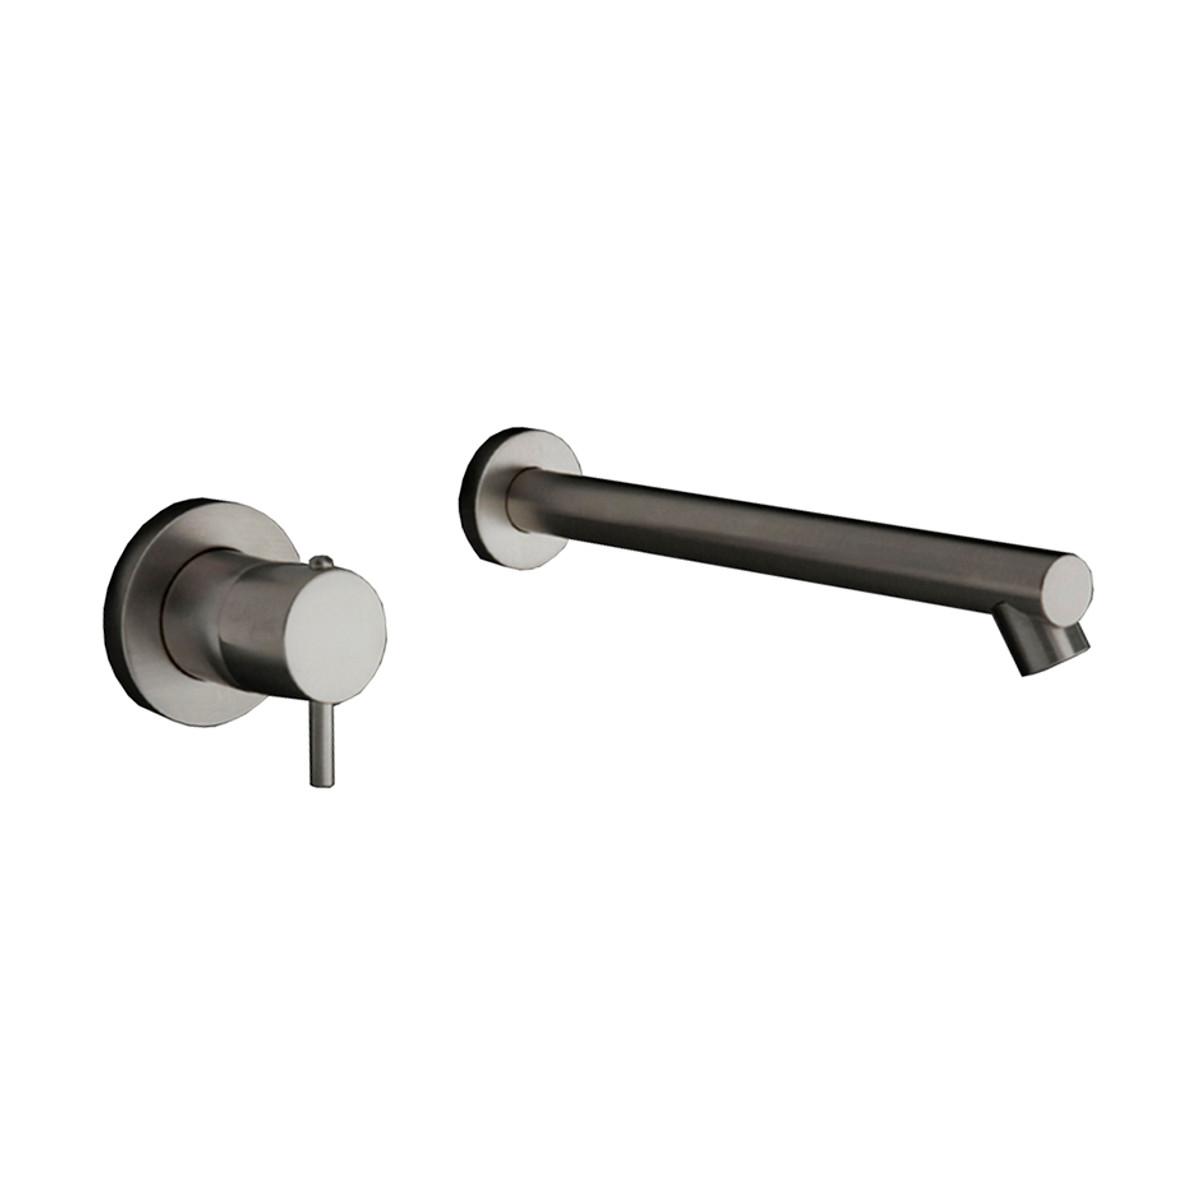 0114SP Minimal Wall Faucet